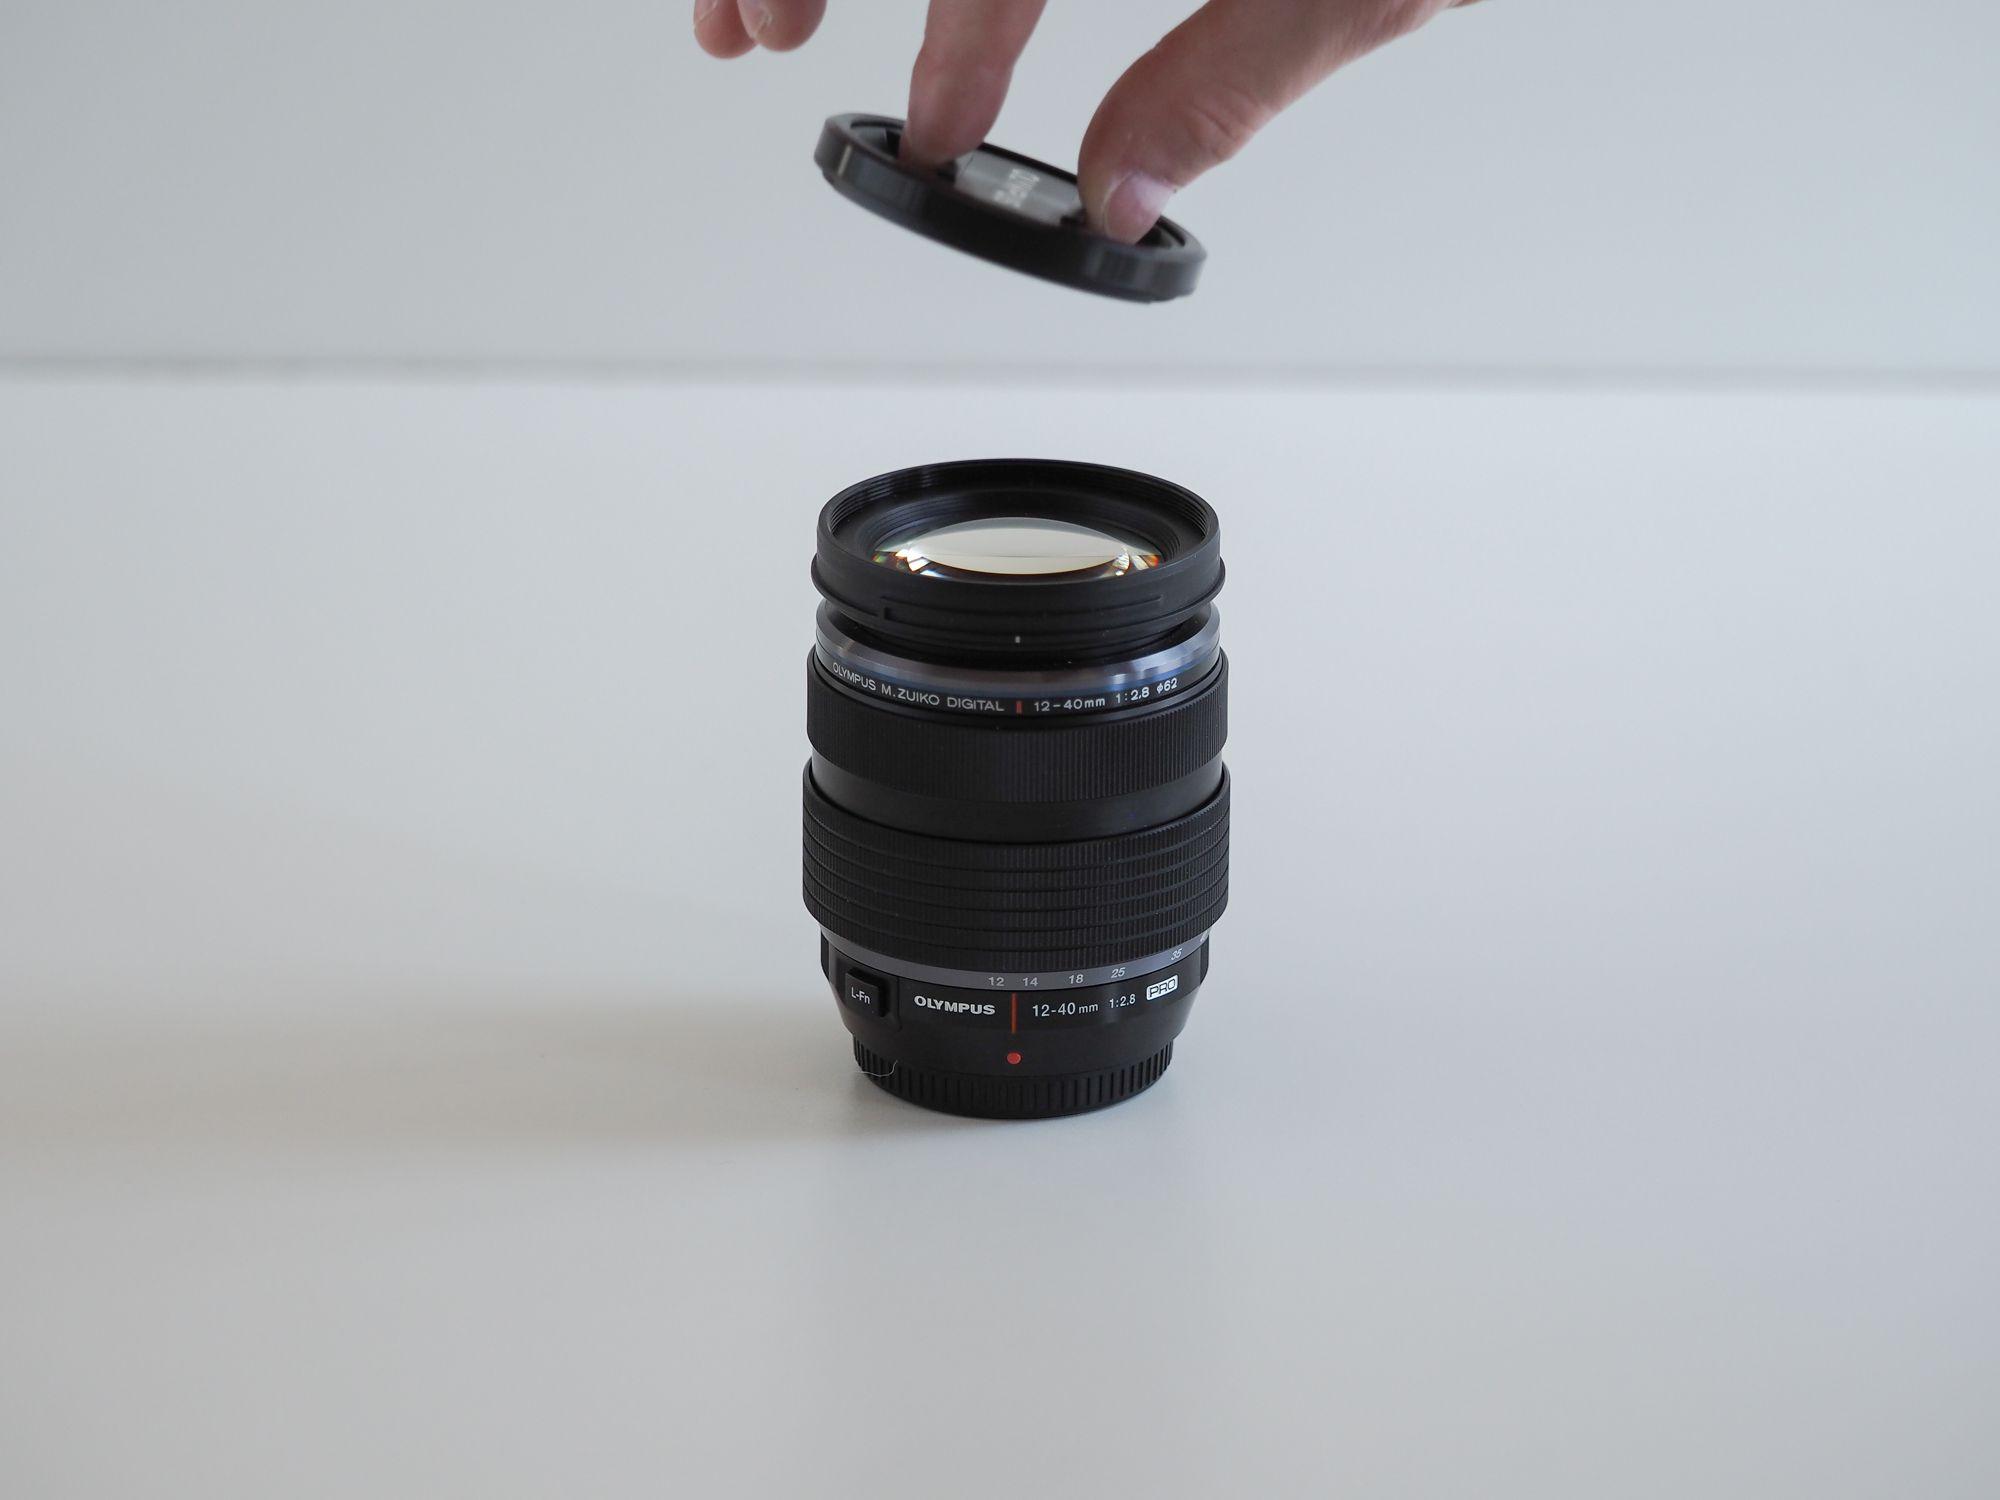 Olympus 12-40mm f/2.8 Pro Lens